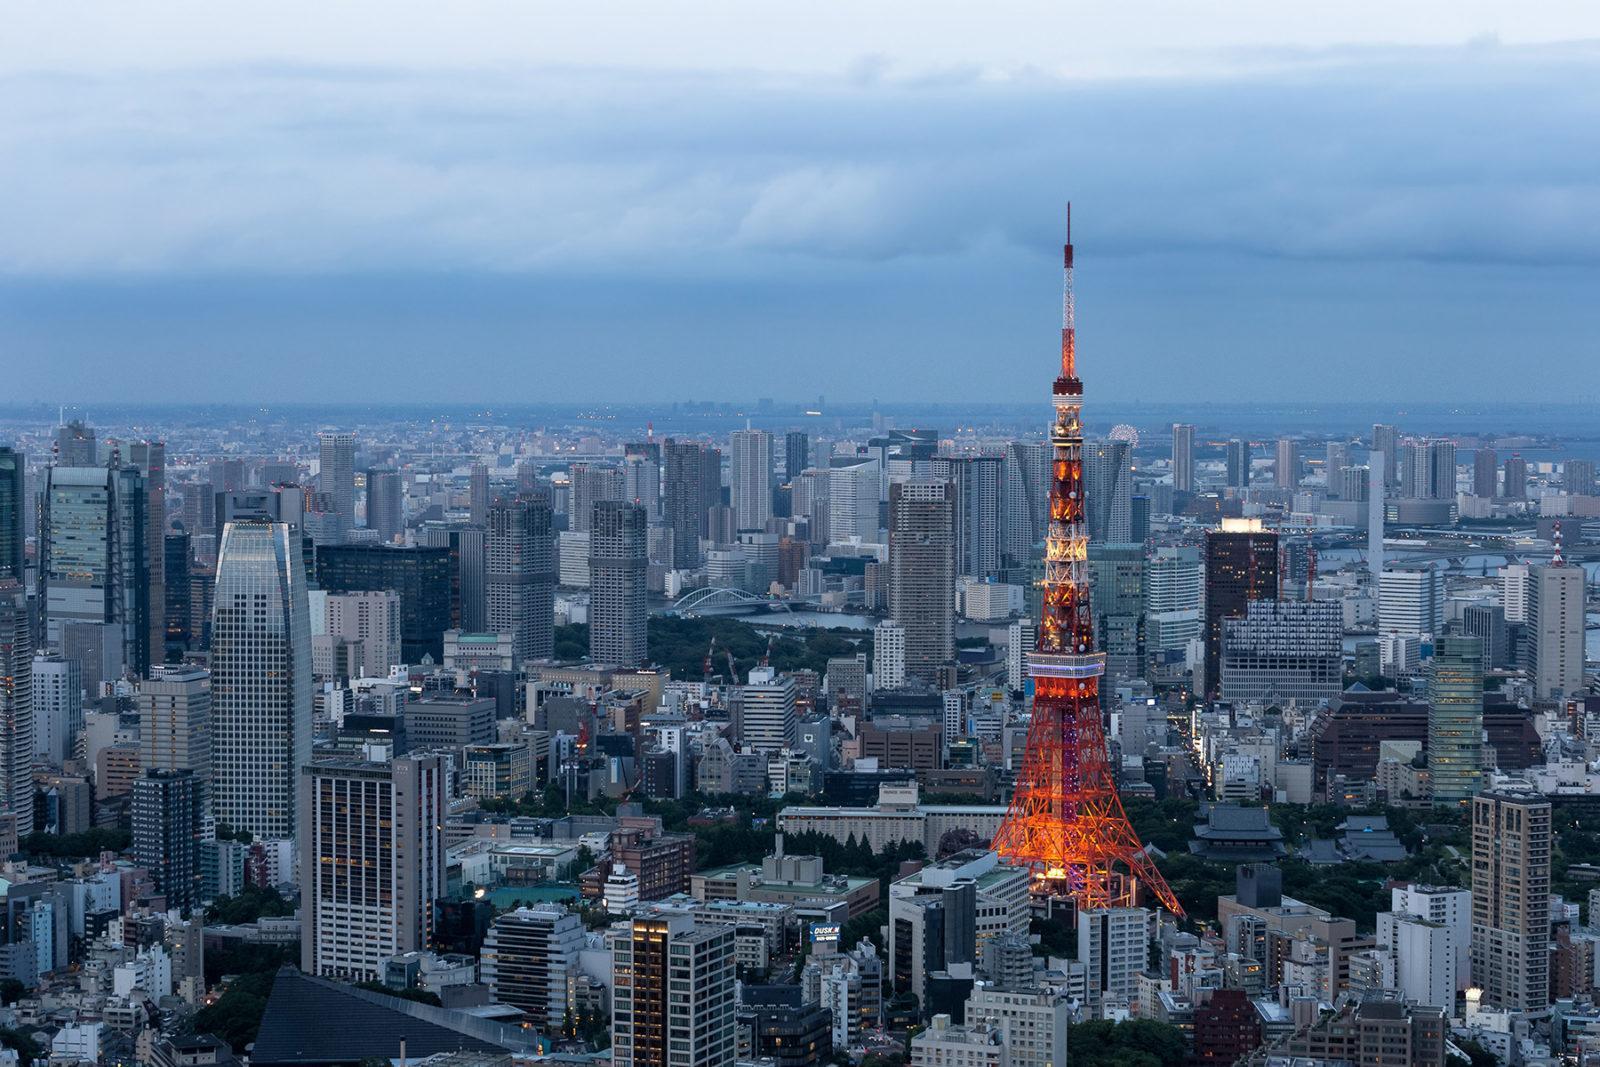 tokyo minato buildings cityscape - ავიაბილეთები ტოკიო